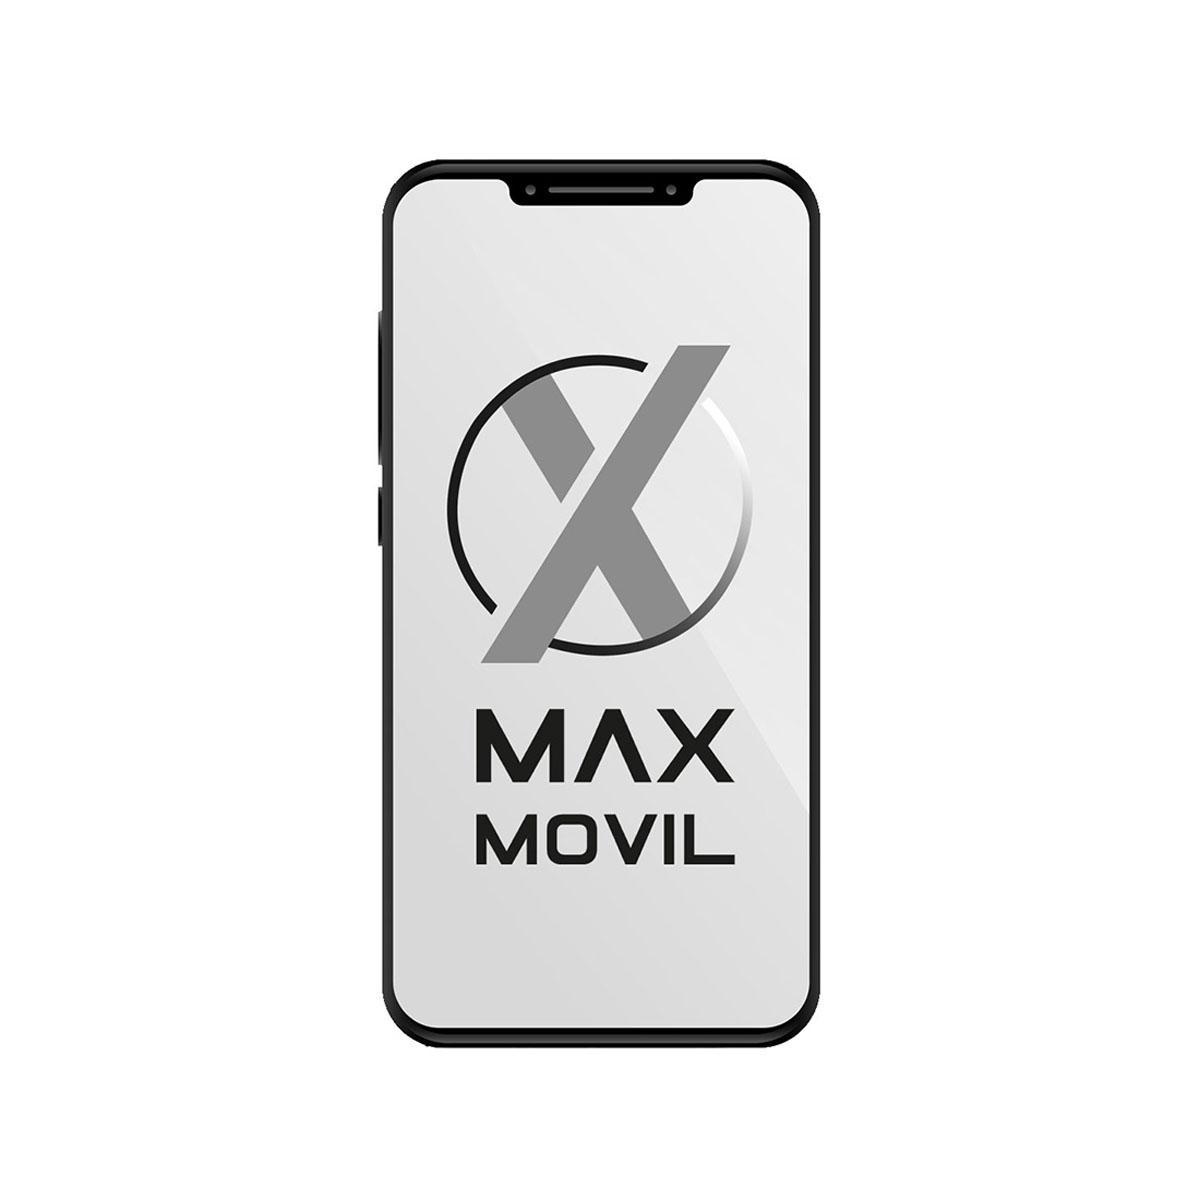 Funda libro Lg CCF-300 blanca para LG Nexus 5